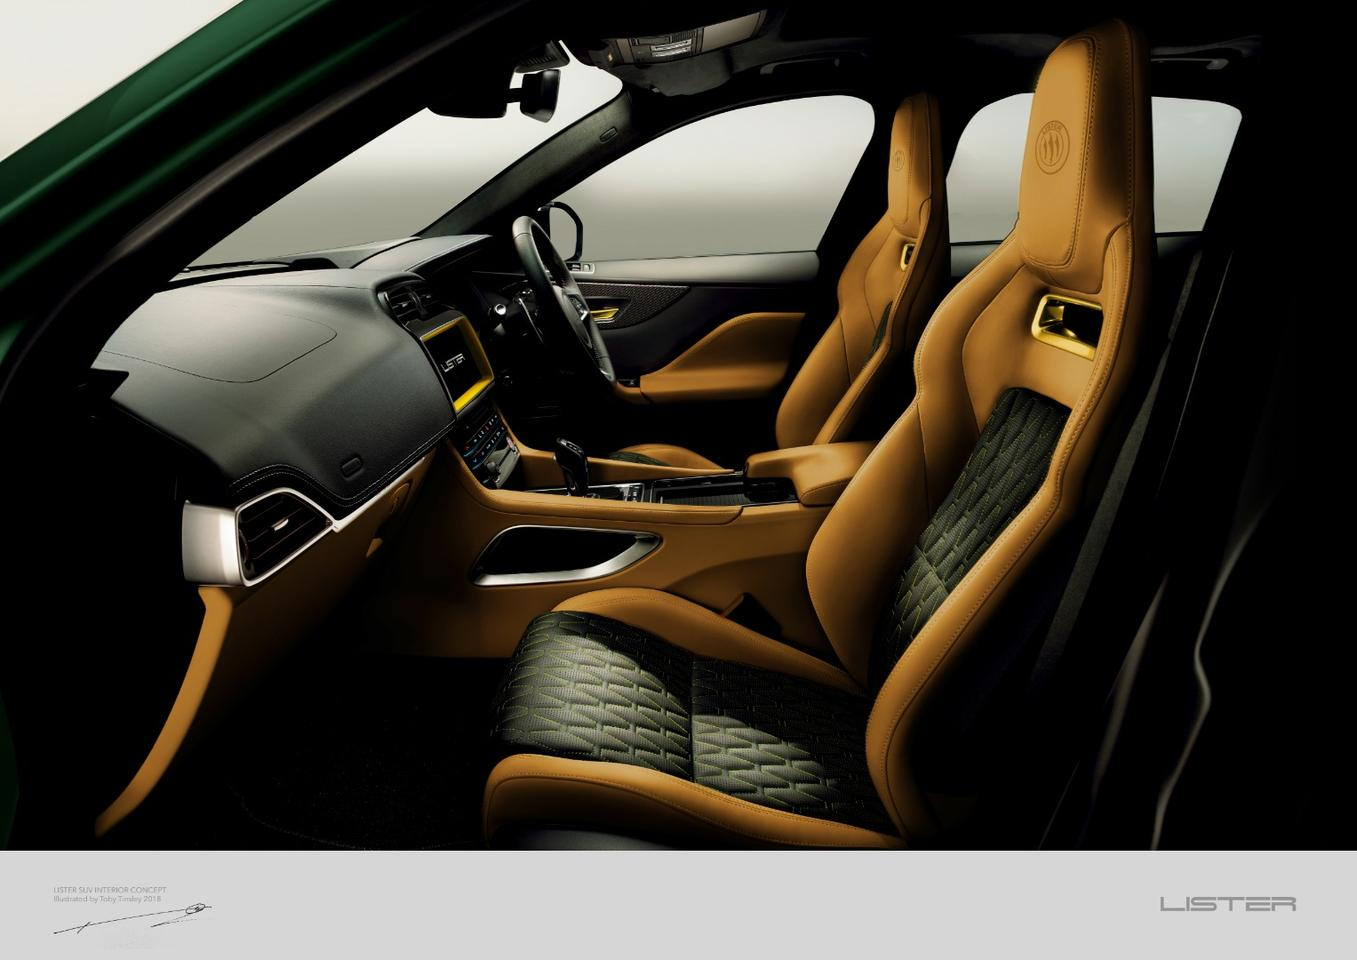 Lister LFP: gorgeous interior